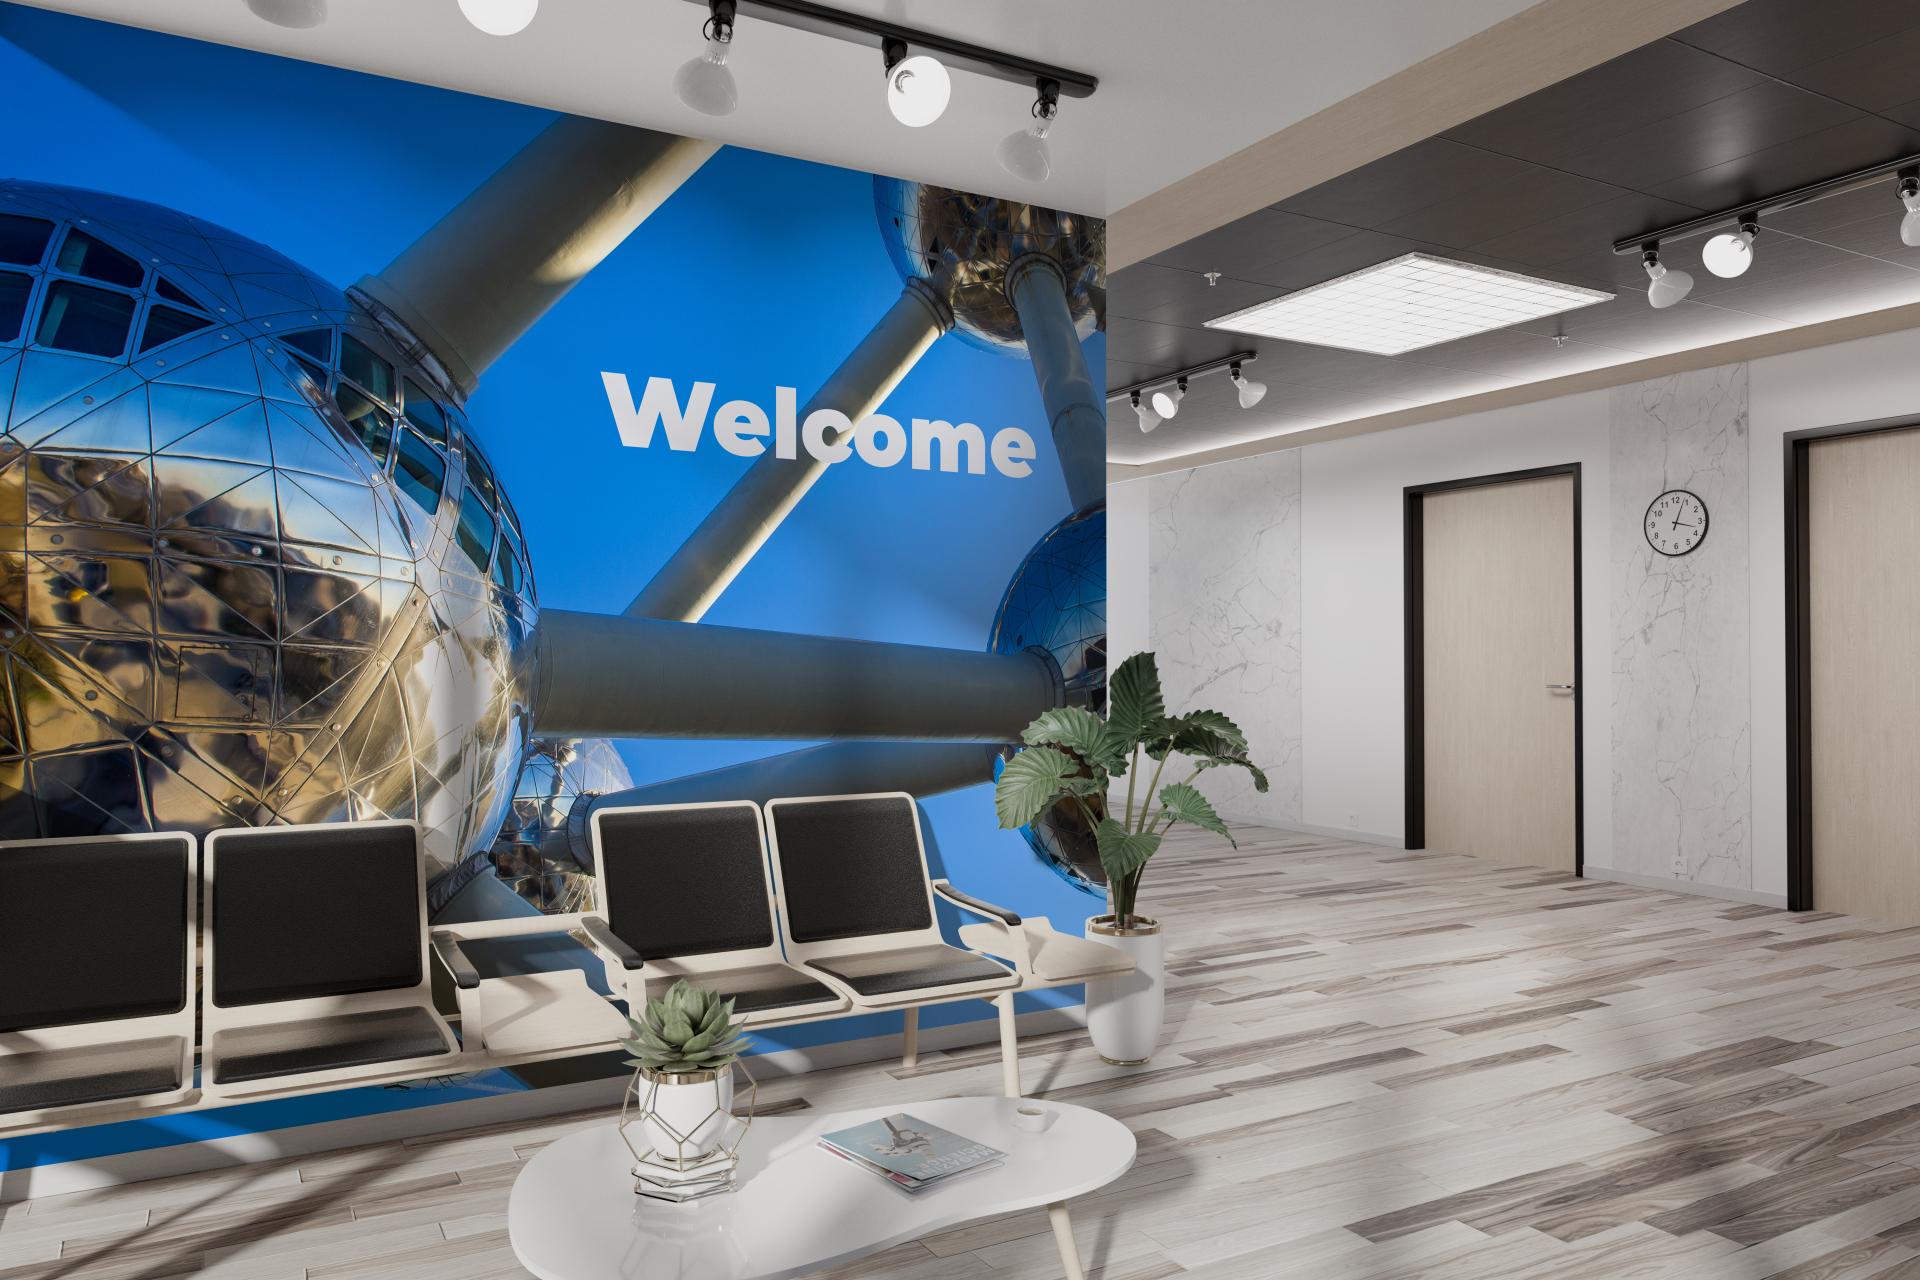 AXA_signage-on-office-interior2